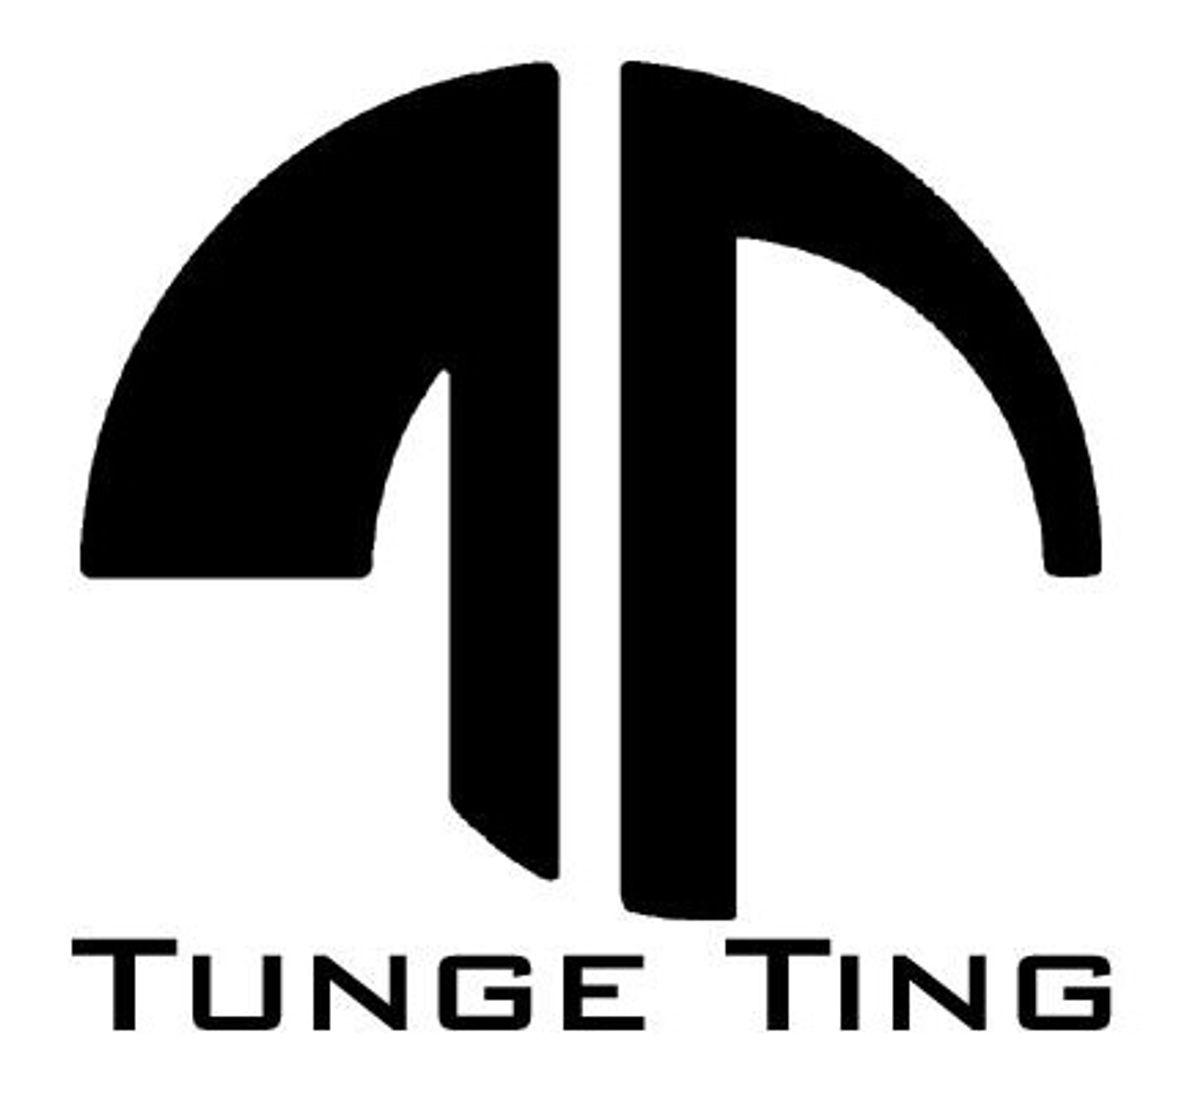 TungeTing